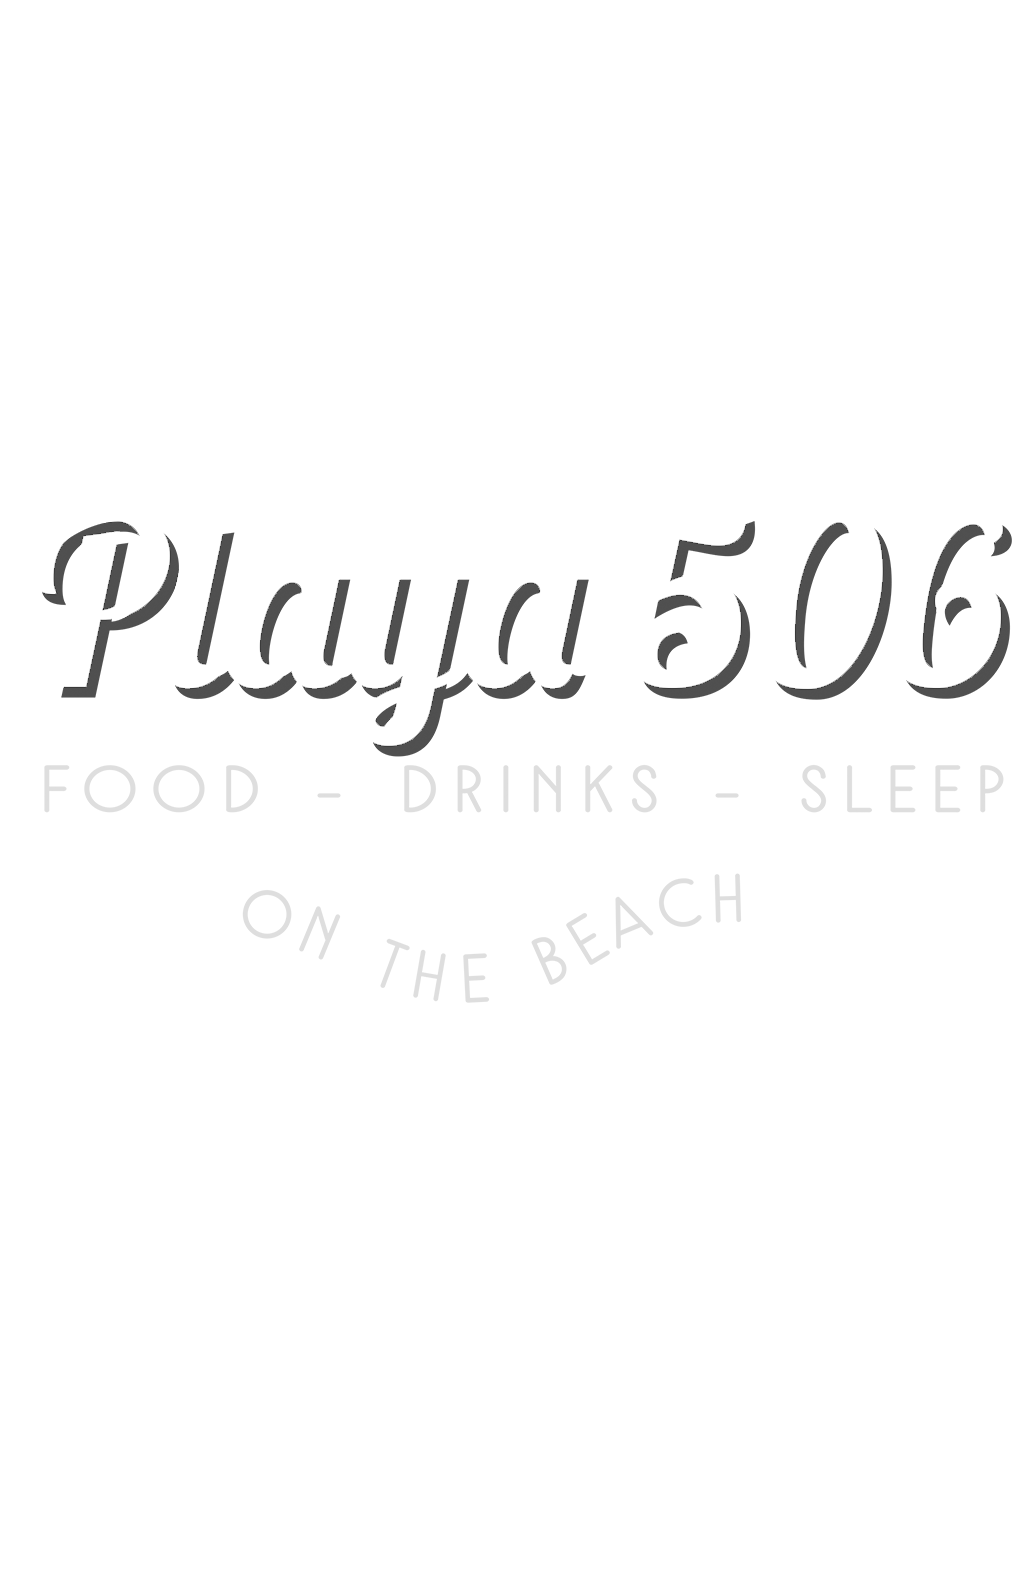 Playa 506